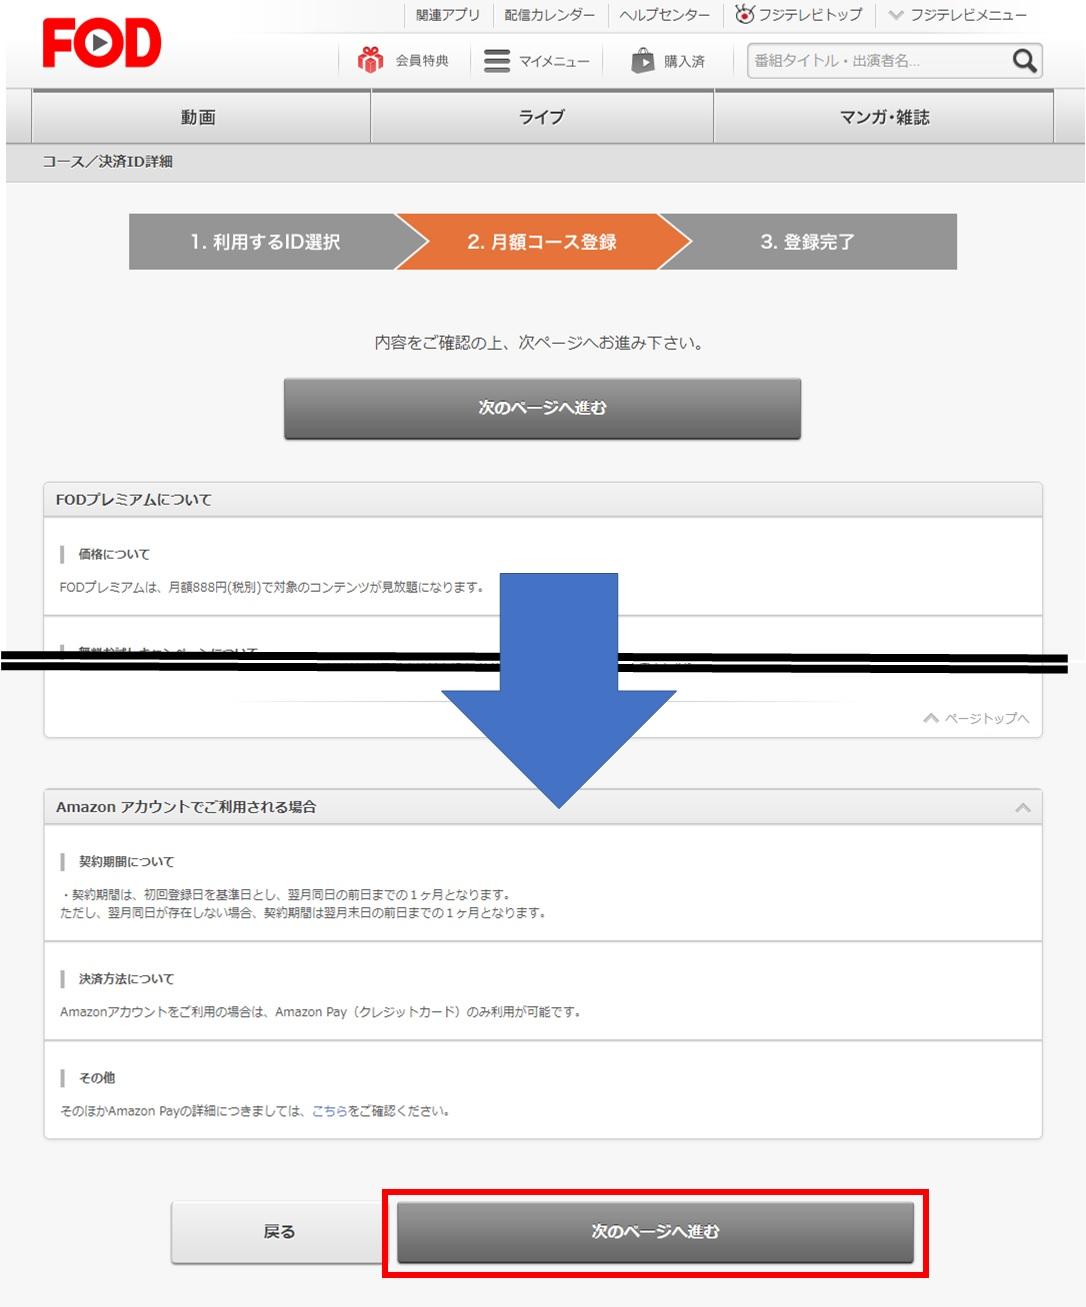 FODプレミアムの無料視聴に申し込みをする方法3月額料金などの確認の画像